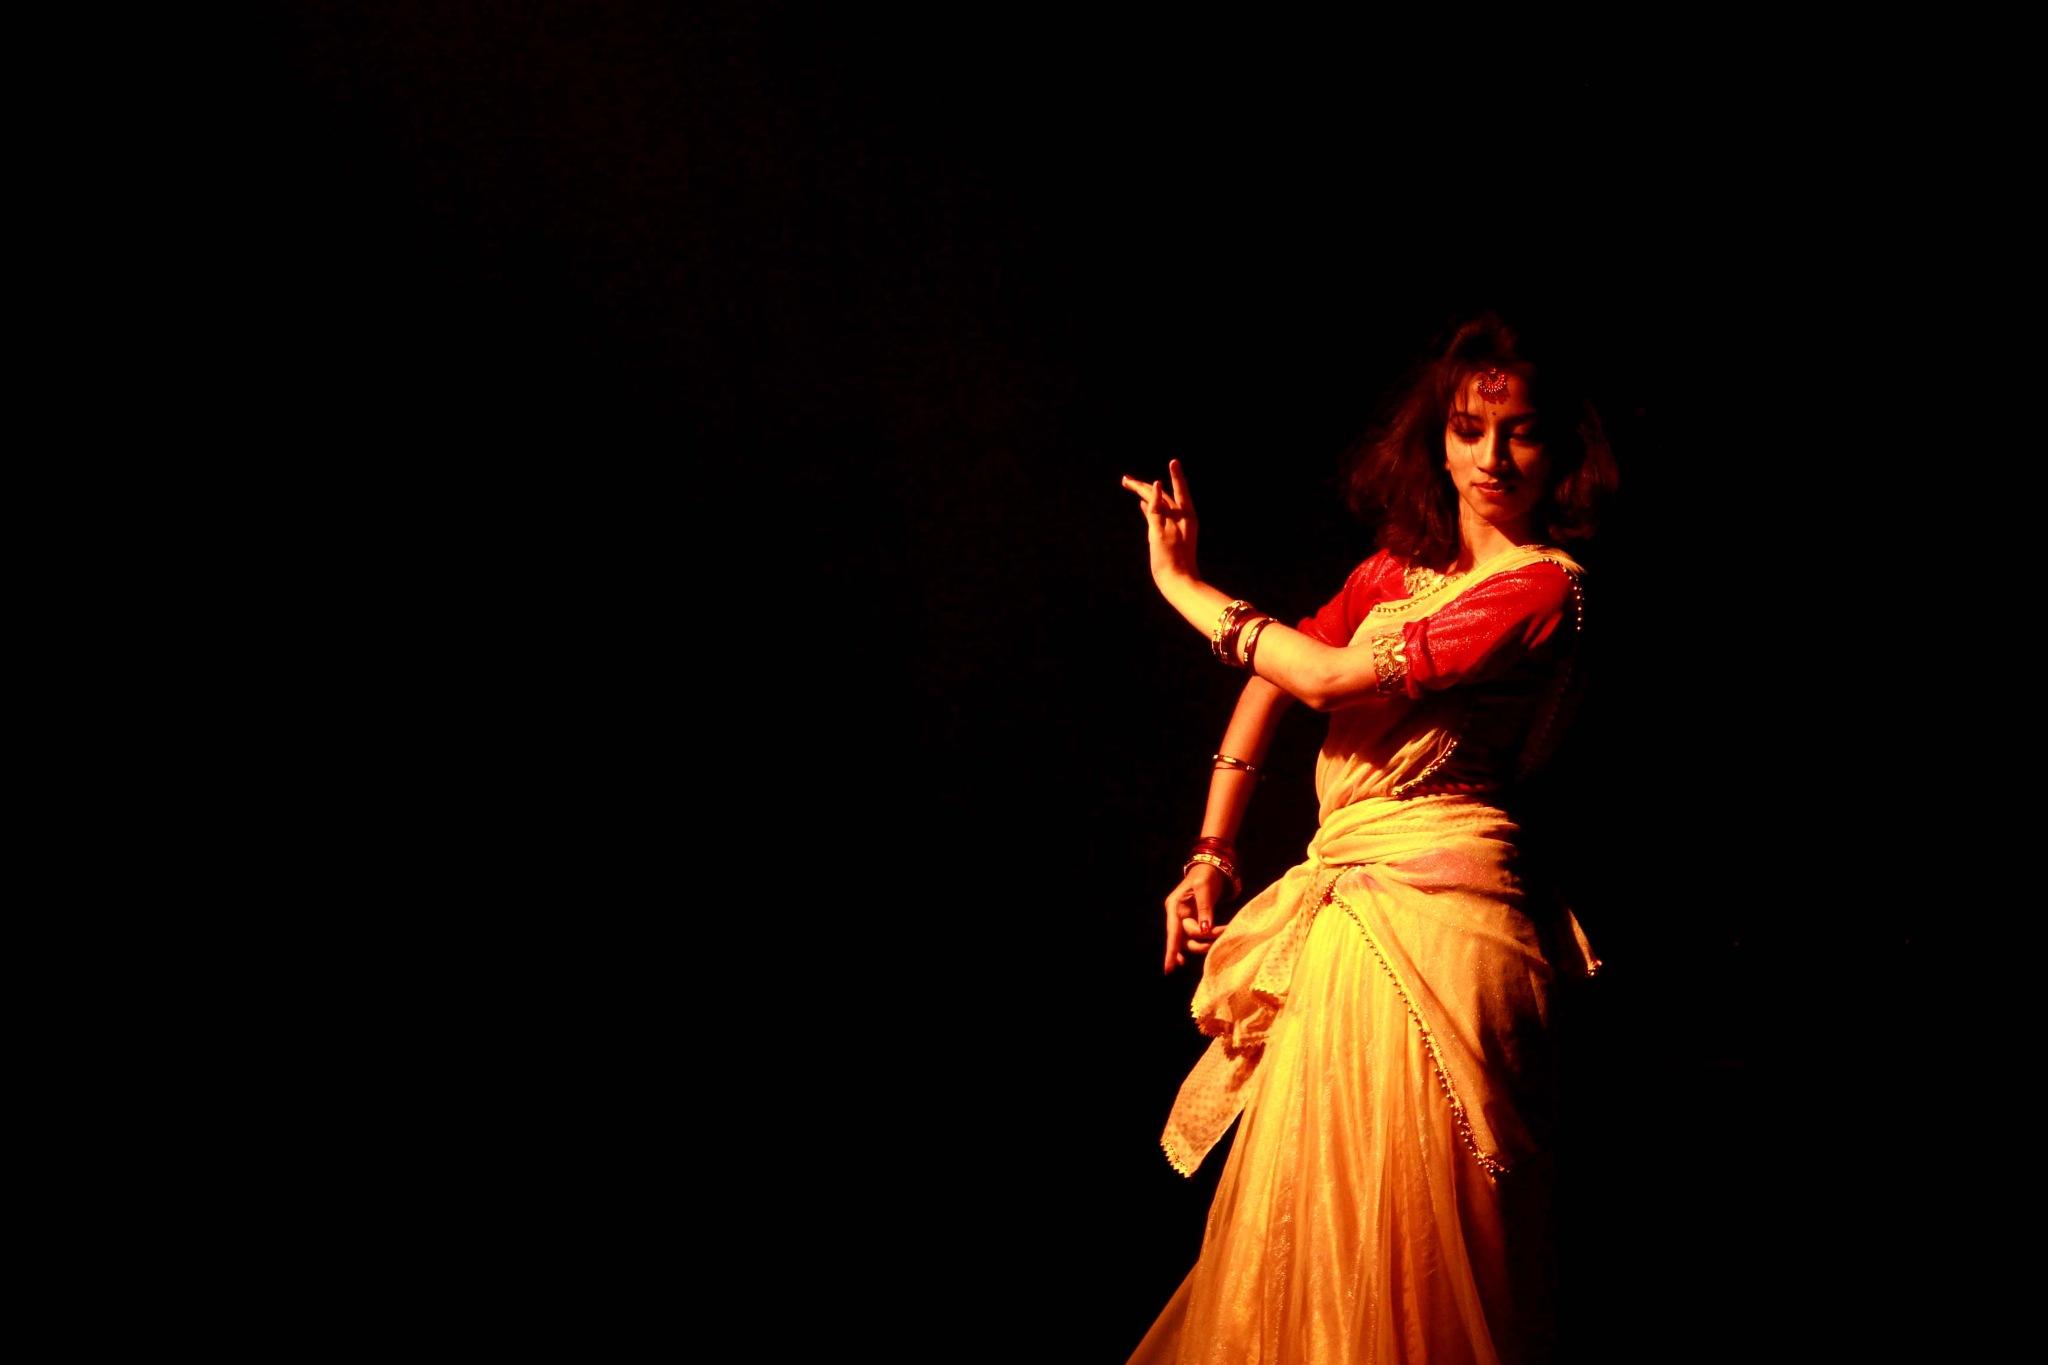 The dancing girl 2 by Rafiqul Islam Tushar